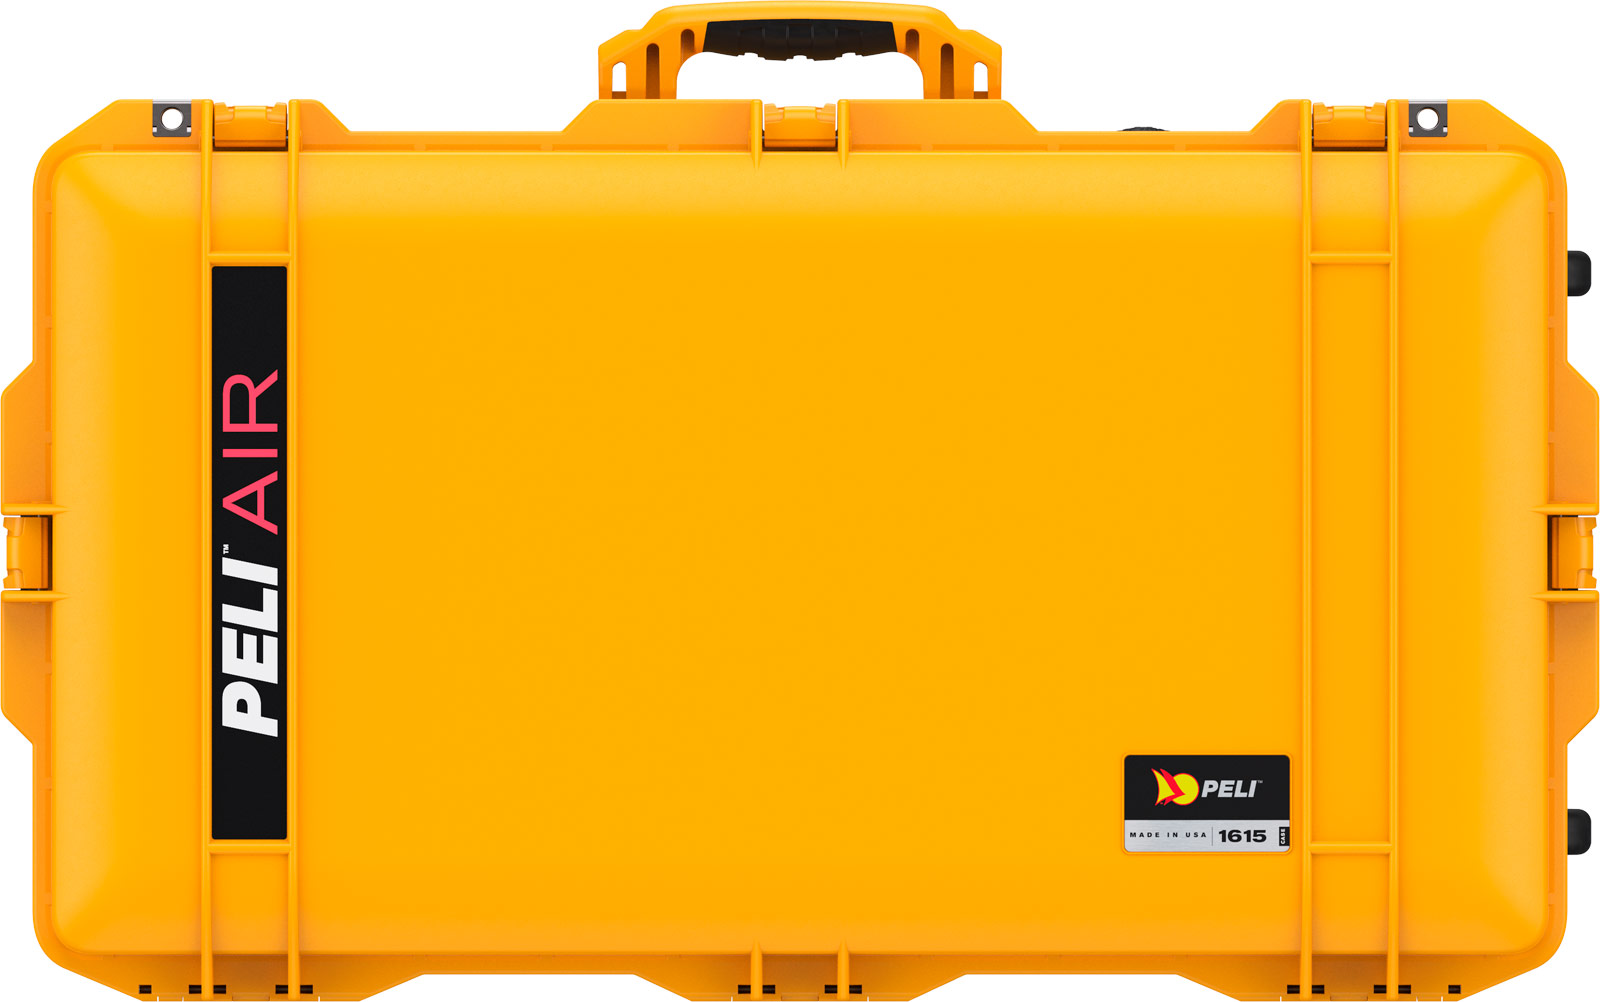 peli 1615 yellow air case hard case